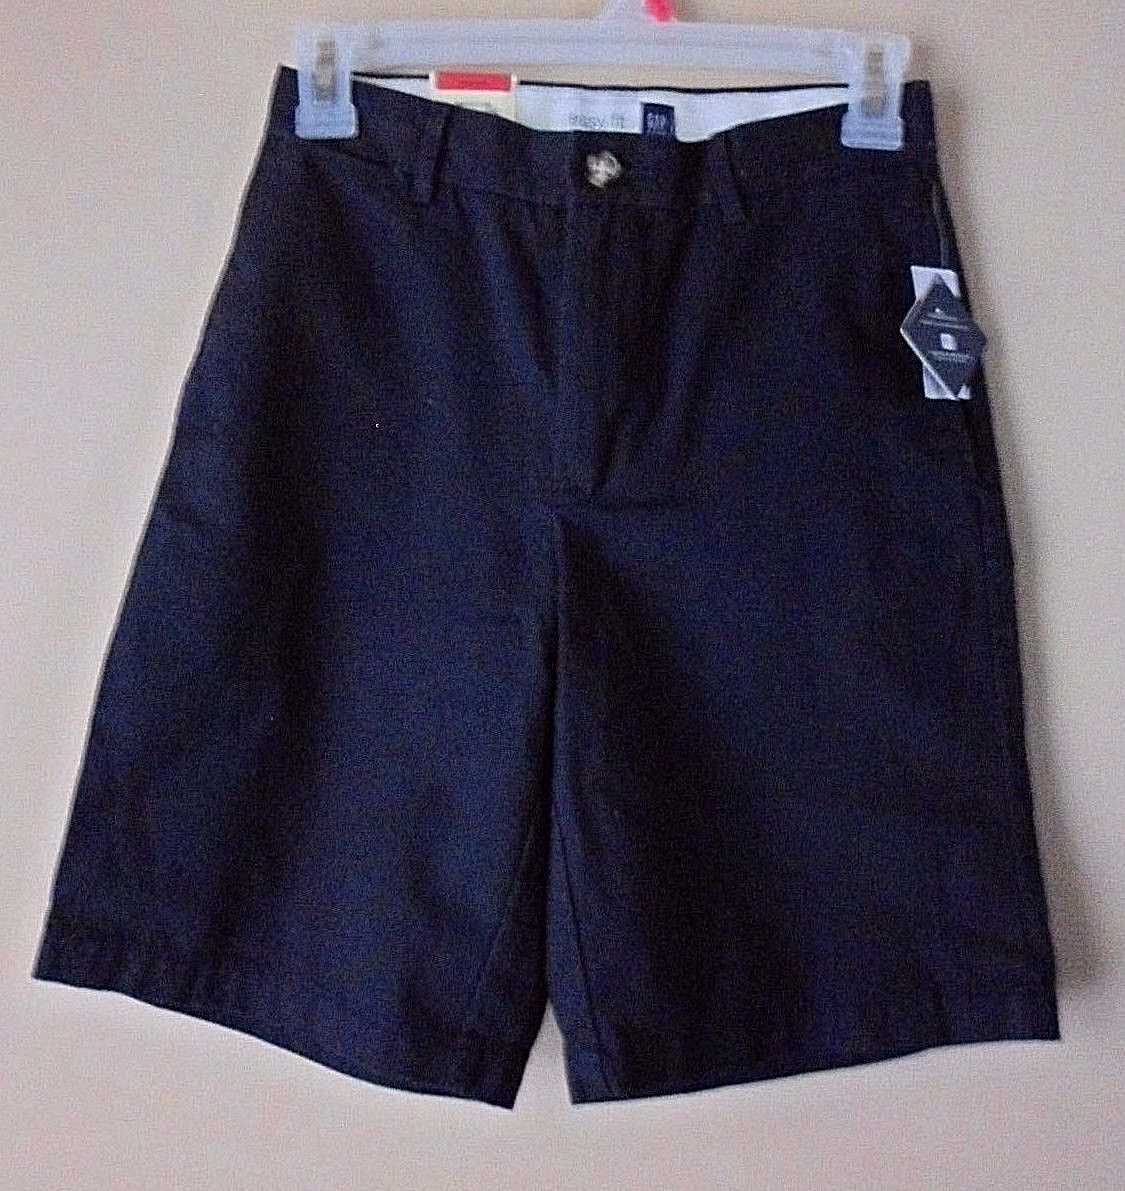 Size 10 NWT Gap Kids Boy/'s Shorts Cargo Tan Khaki Shorts